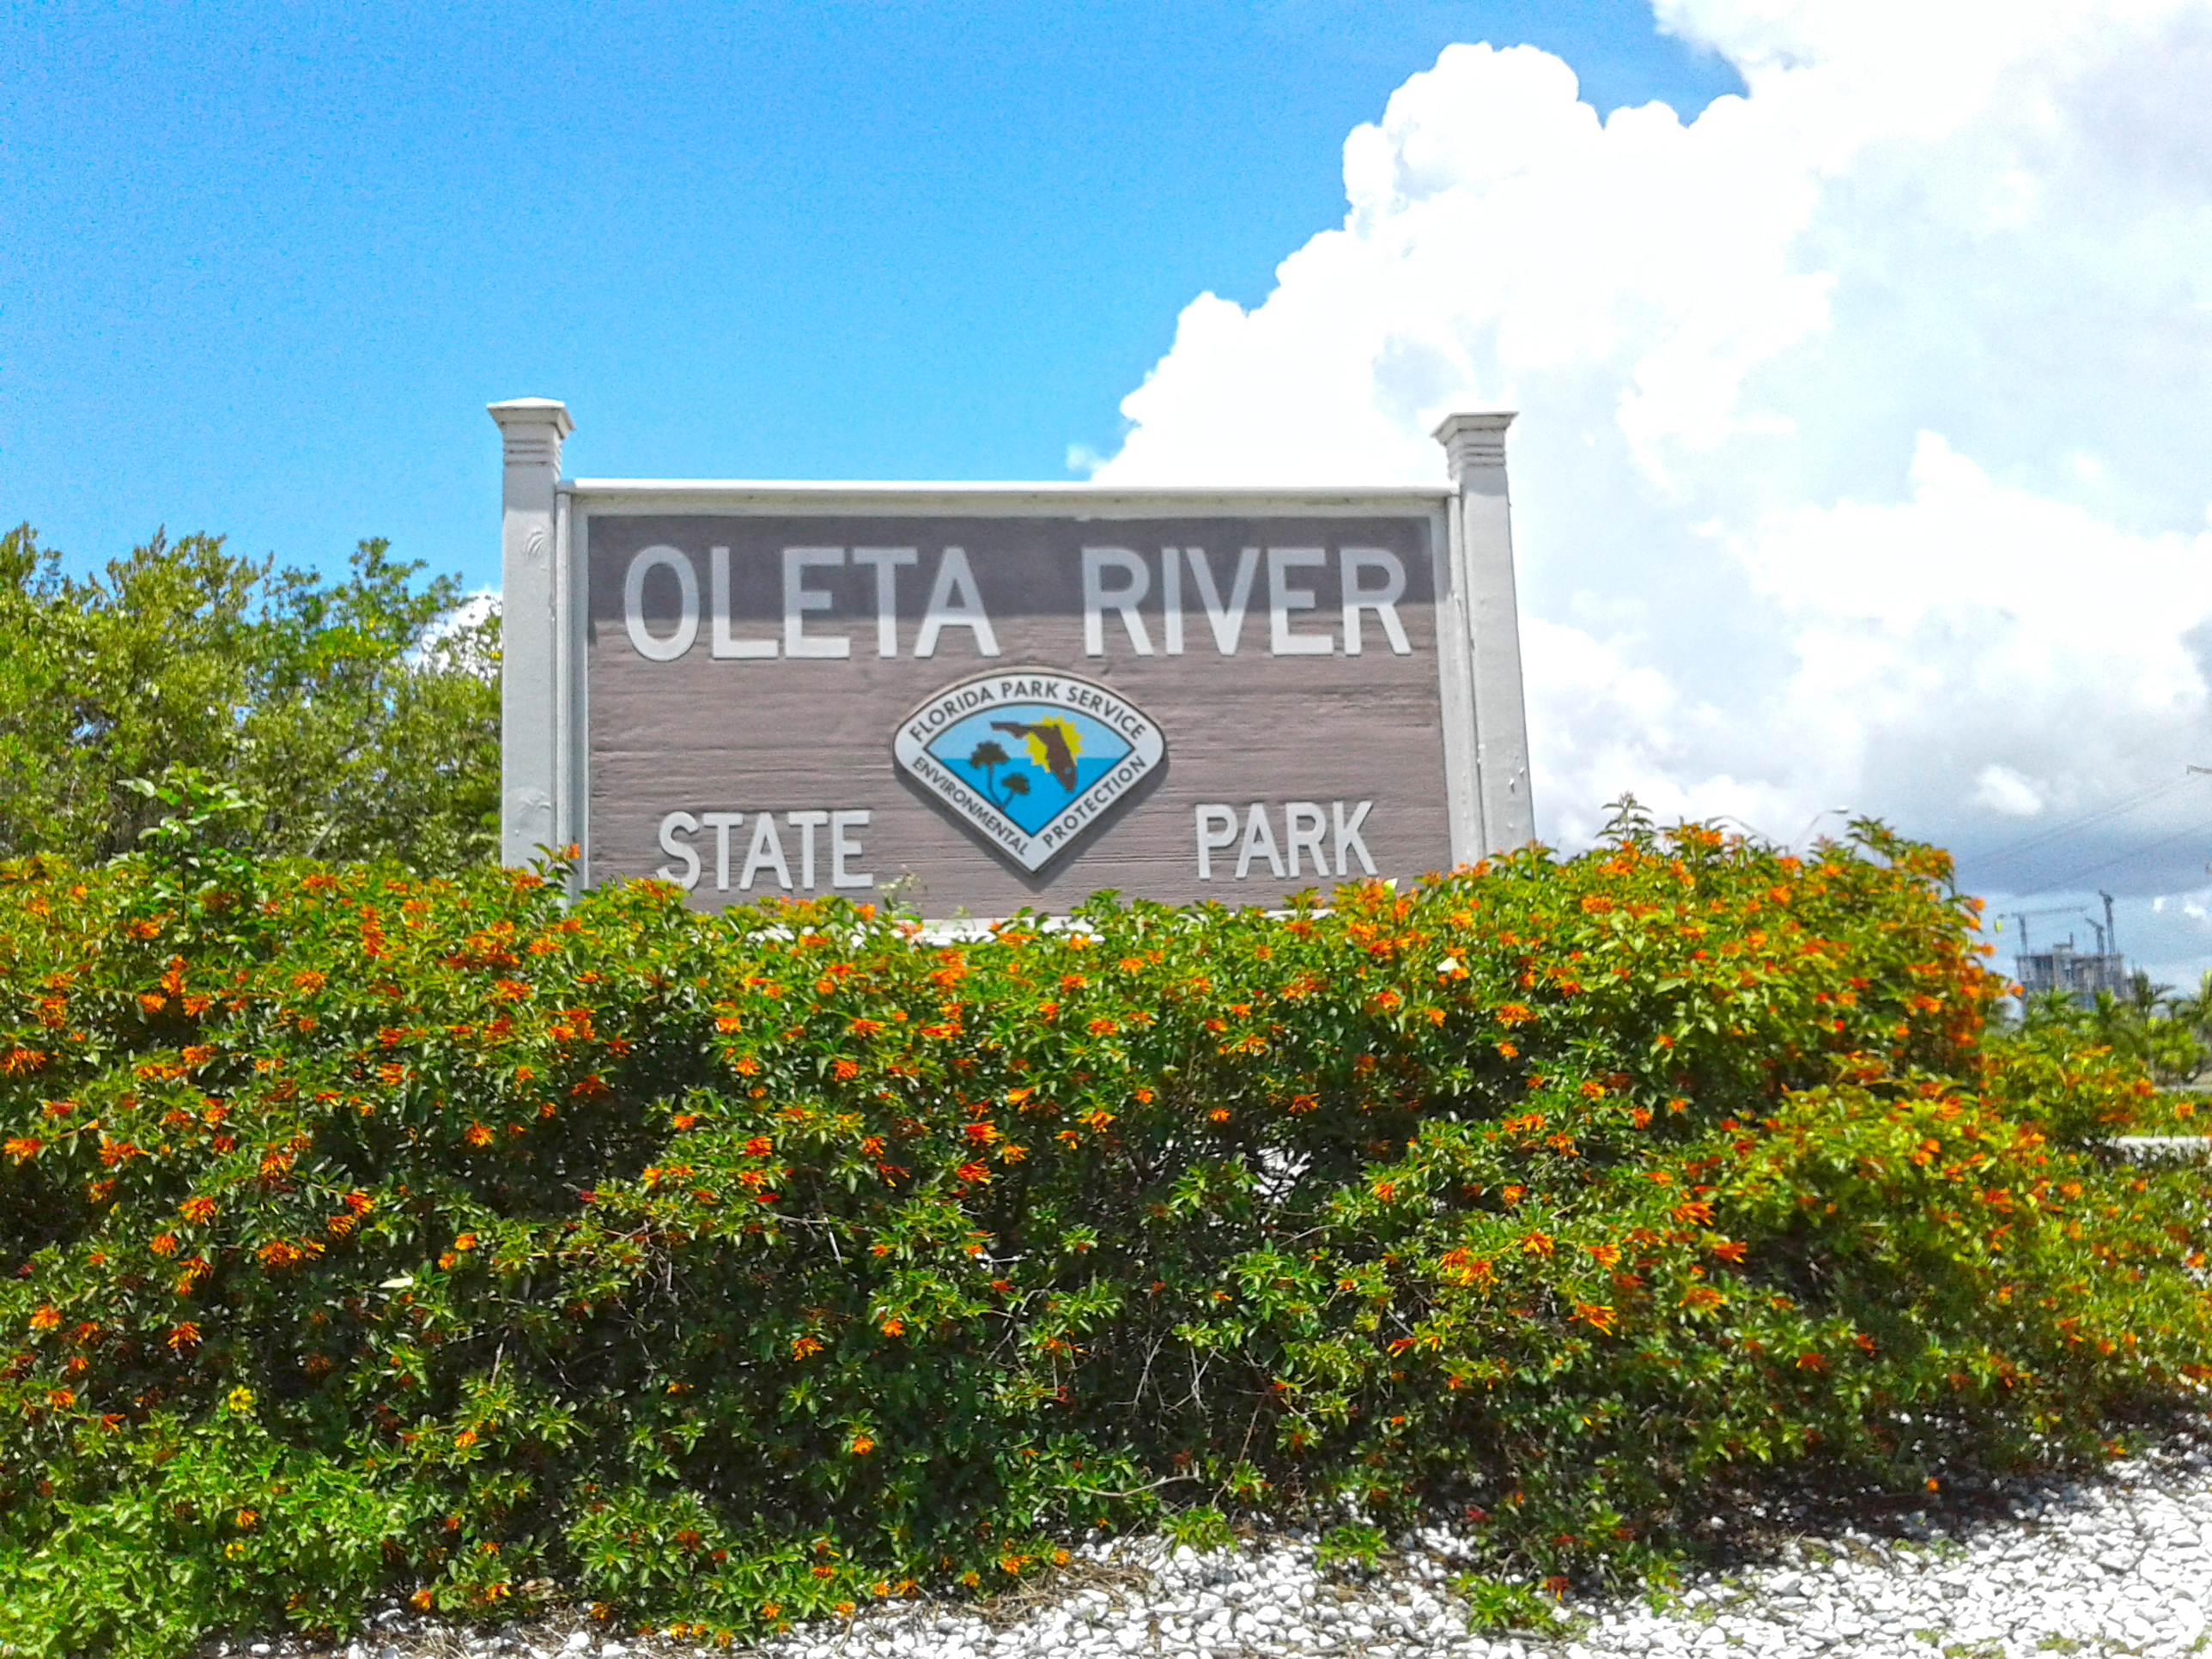 Oleta River State Park Wikipedia